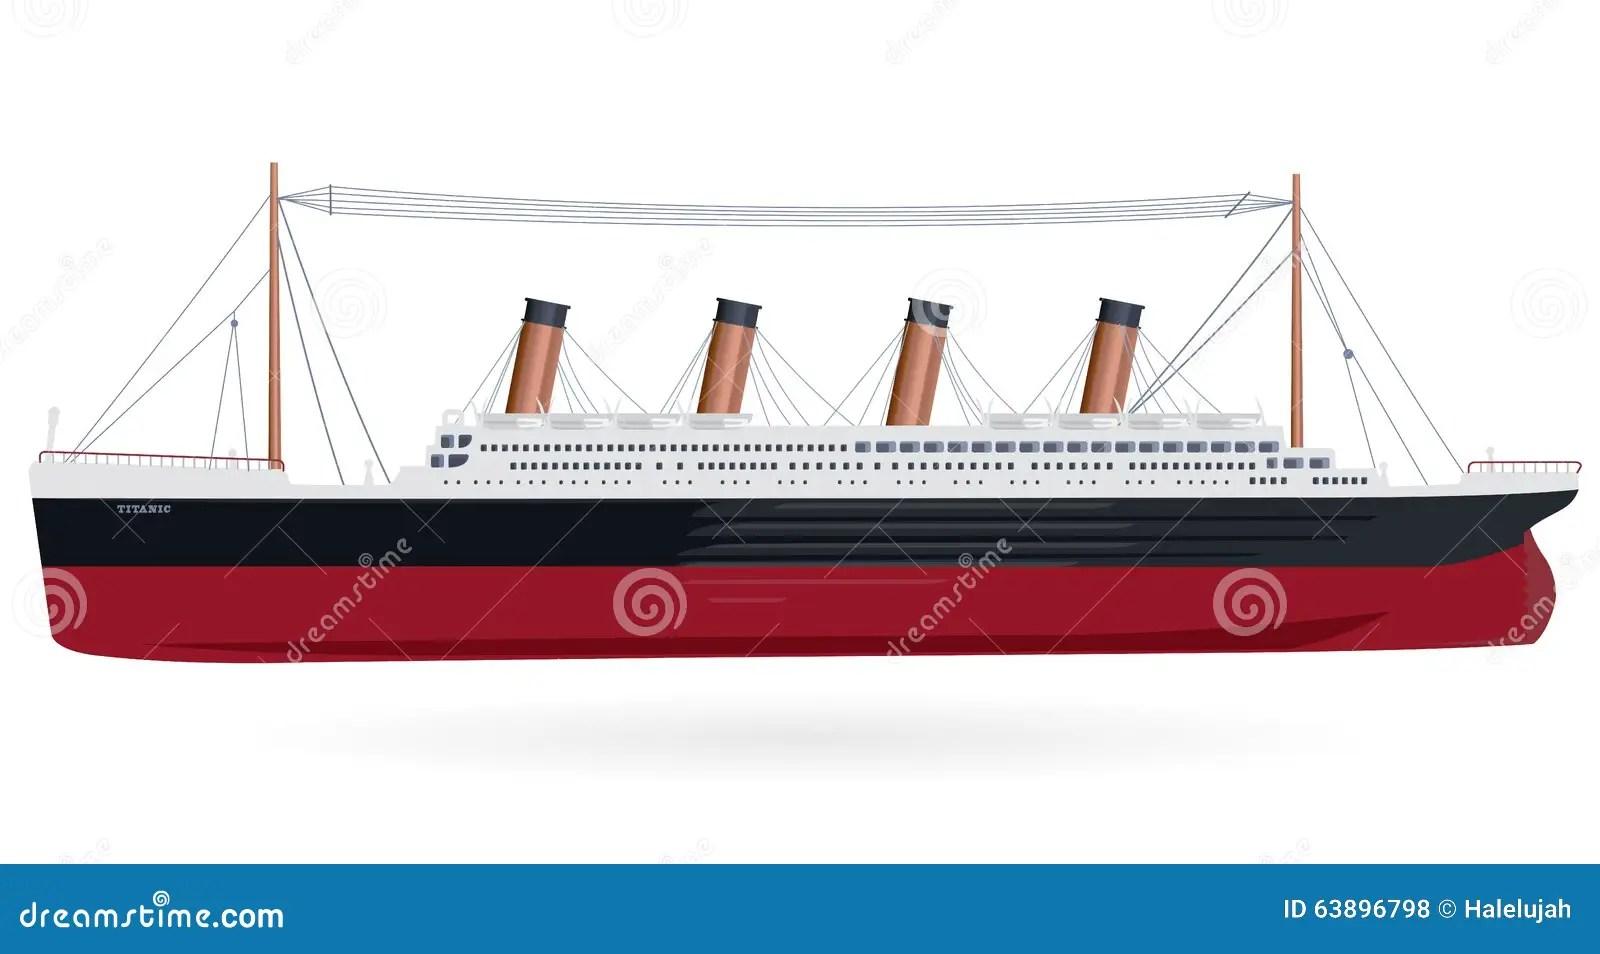 titanic boat diagram toyota 22r vacuum emergency vehicle sign elsavadorla